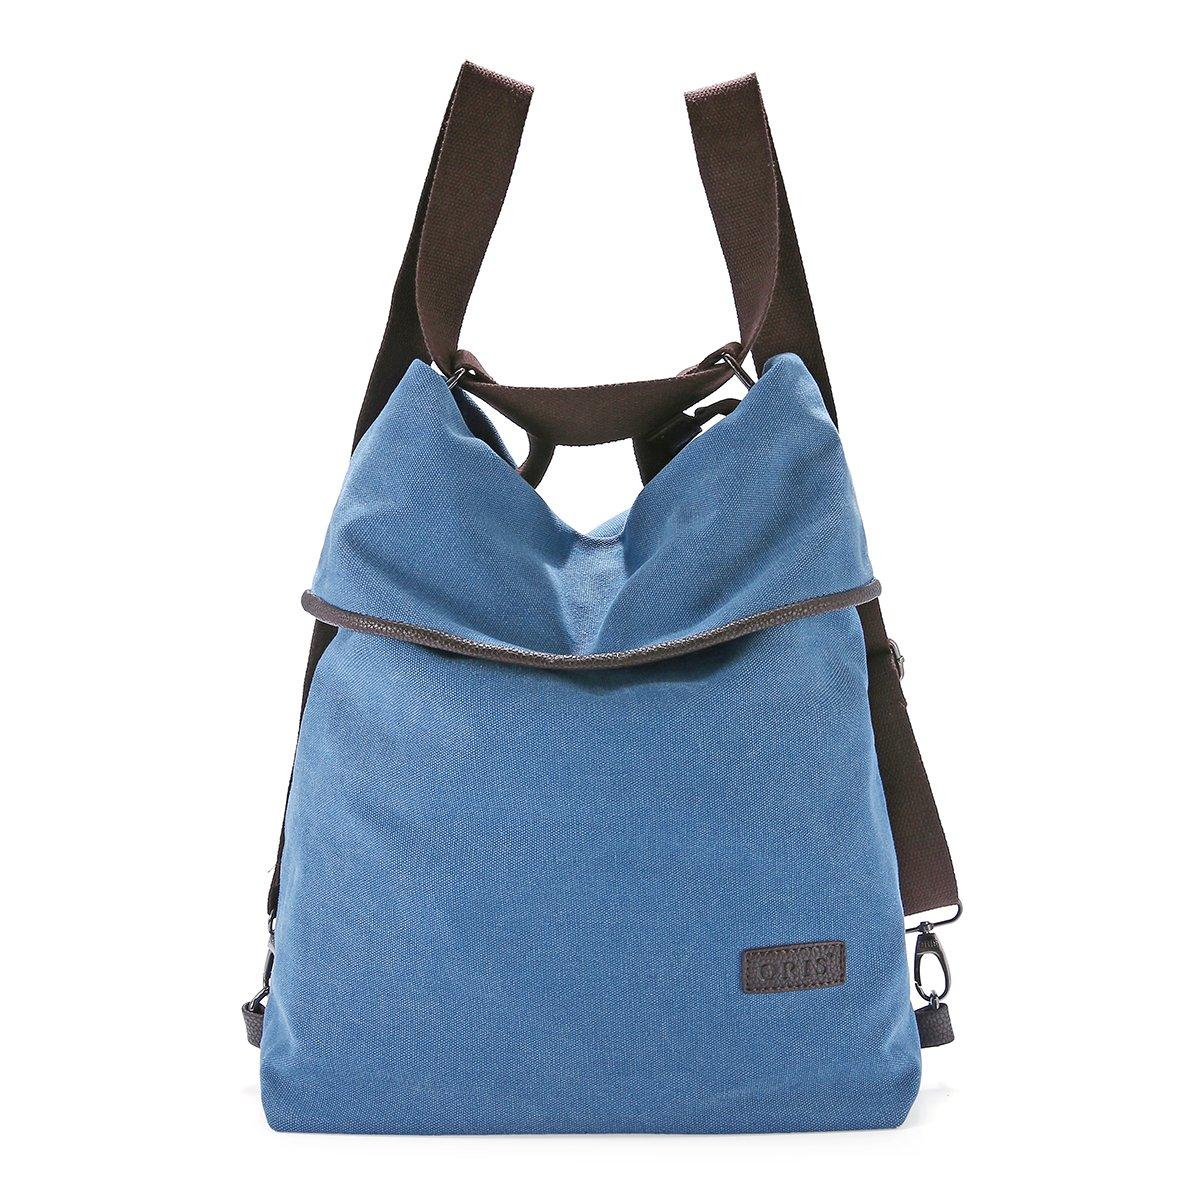 JOSEKO Multifunction Canvas Bag, Women Multifunctional Shoulder Bag Canvas Backpack Casual Travel Daypack Multifunctional Shoulder Bag Handbag Purse,Large Capacity